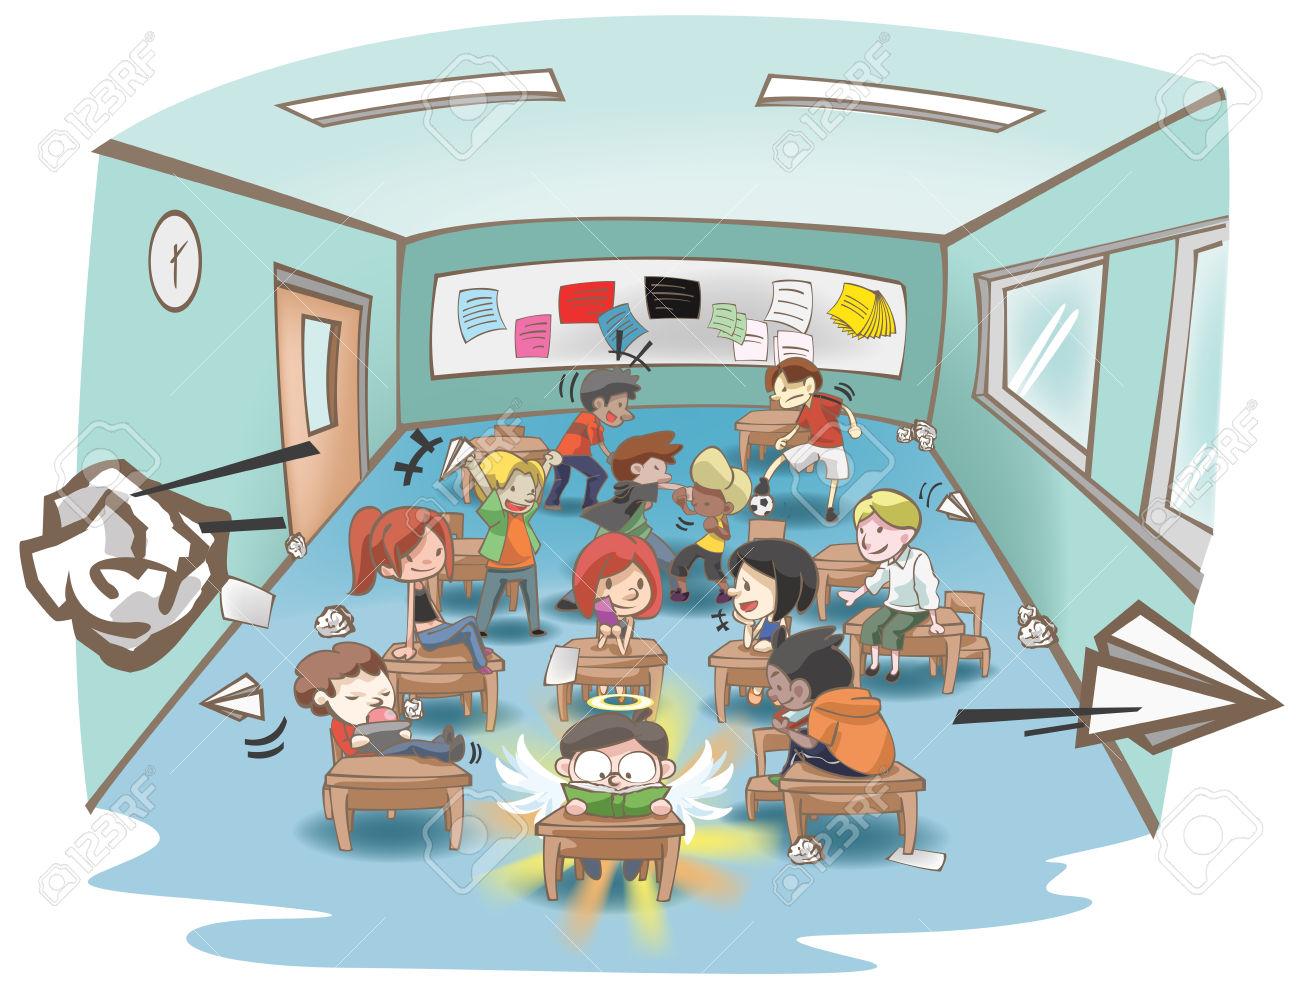 Cartoon Illustration Of A Messy School Classroom Full Of Naughty.